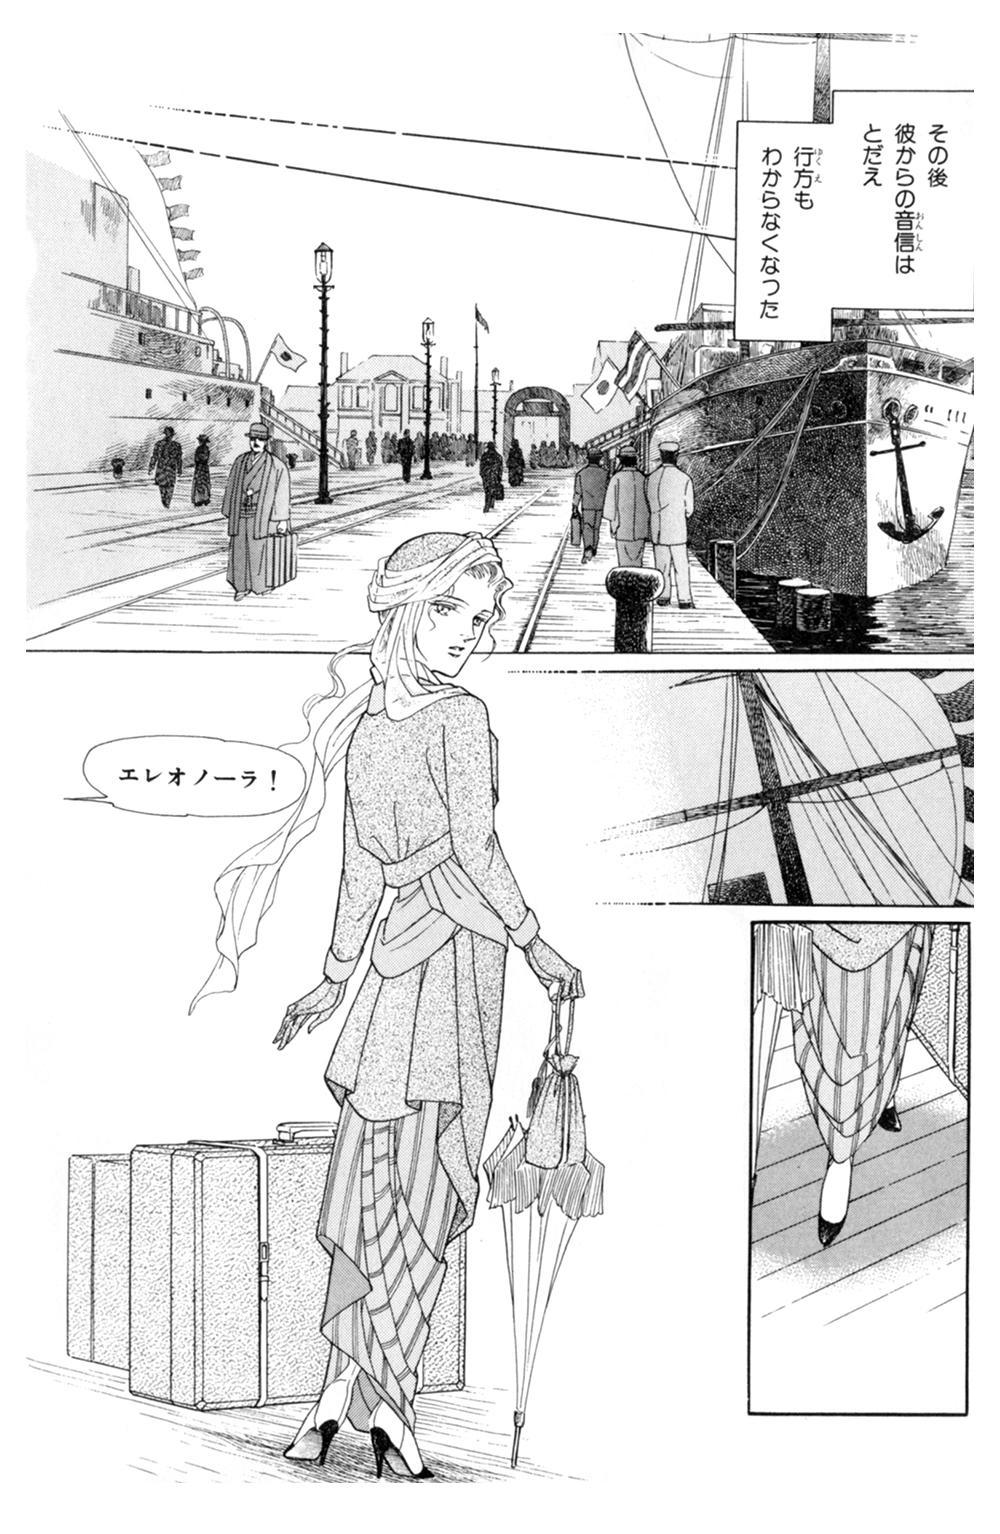 雨柳堂夢咄 第7話「金色の鶏」①uryudo-04-170.jpg